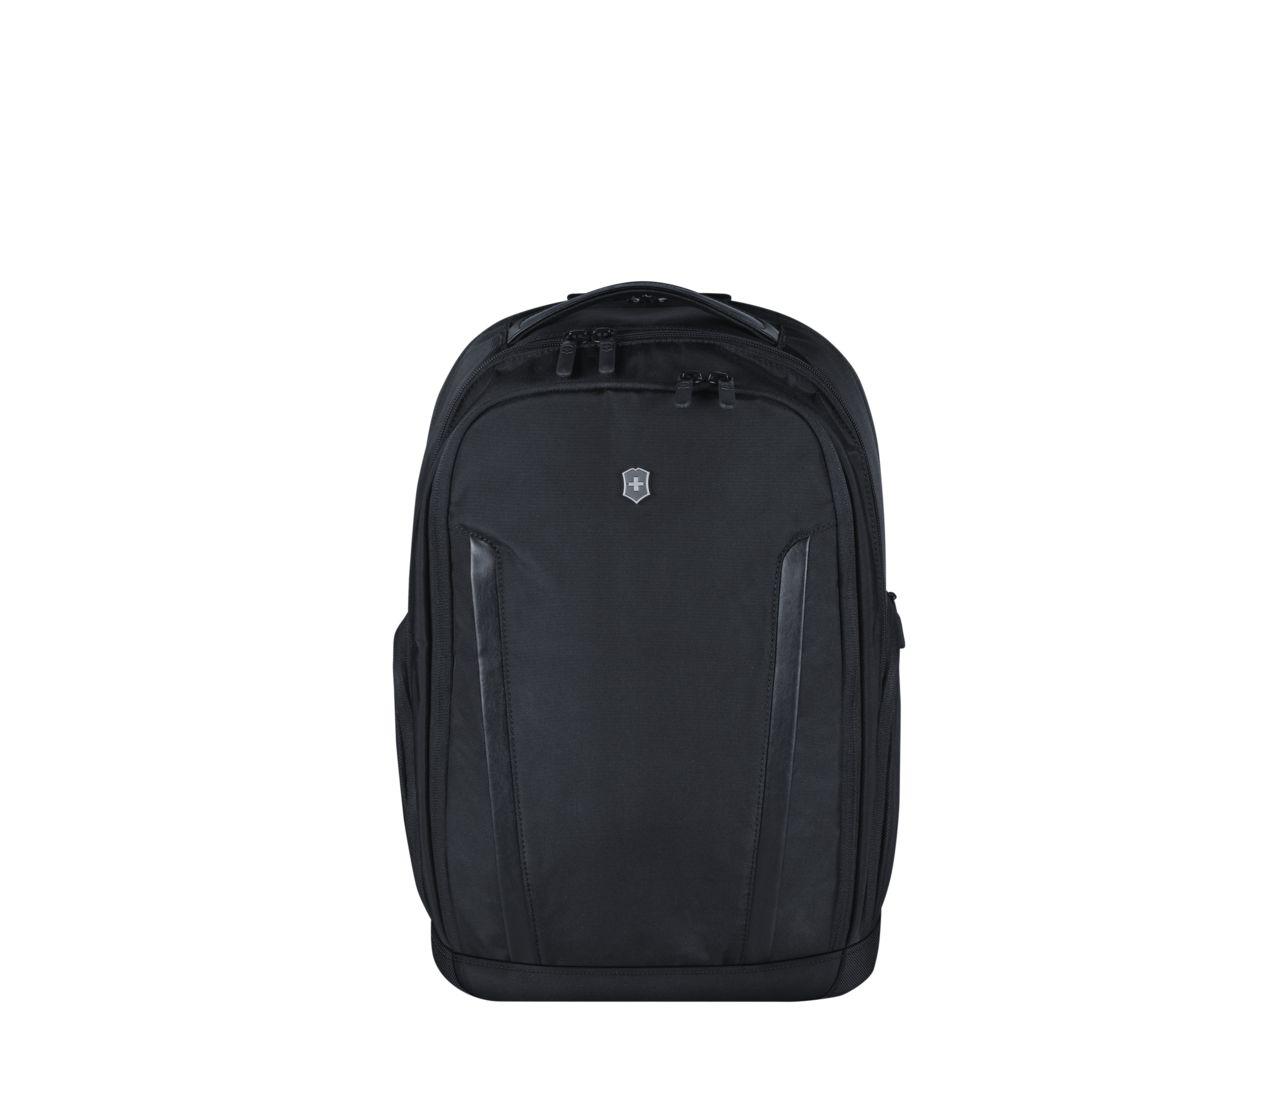 1336b708f Victorinox Essentials Laptop Backpack in black - 602154